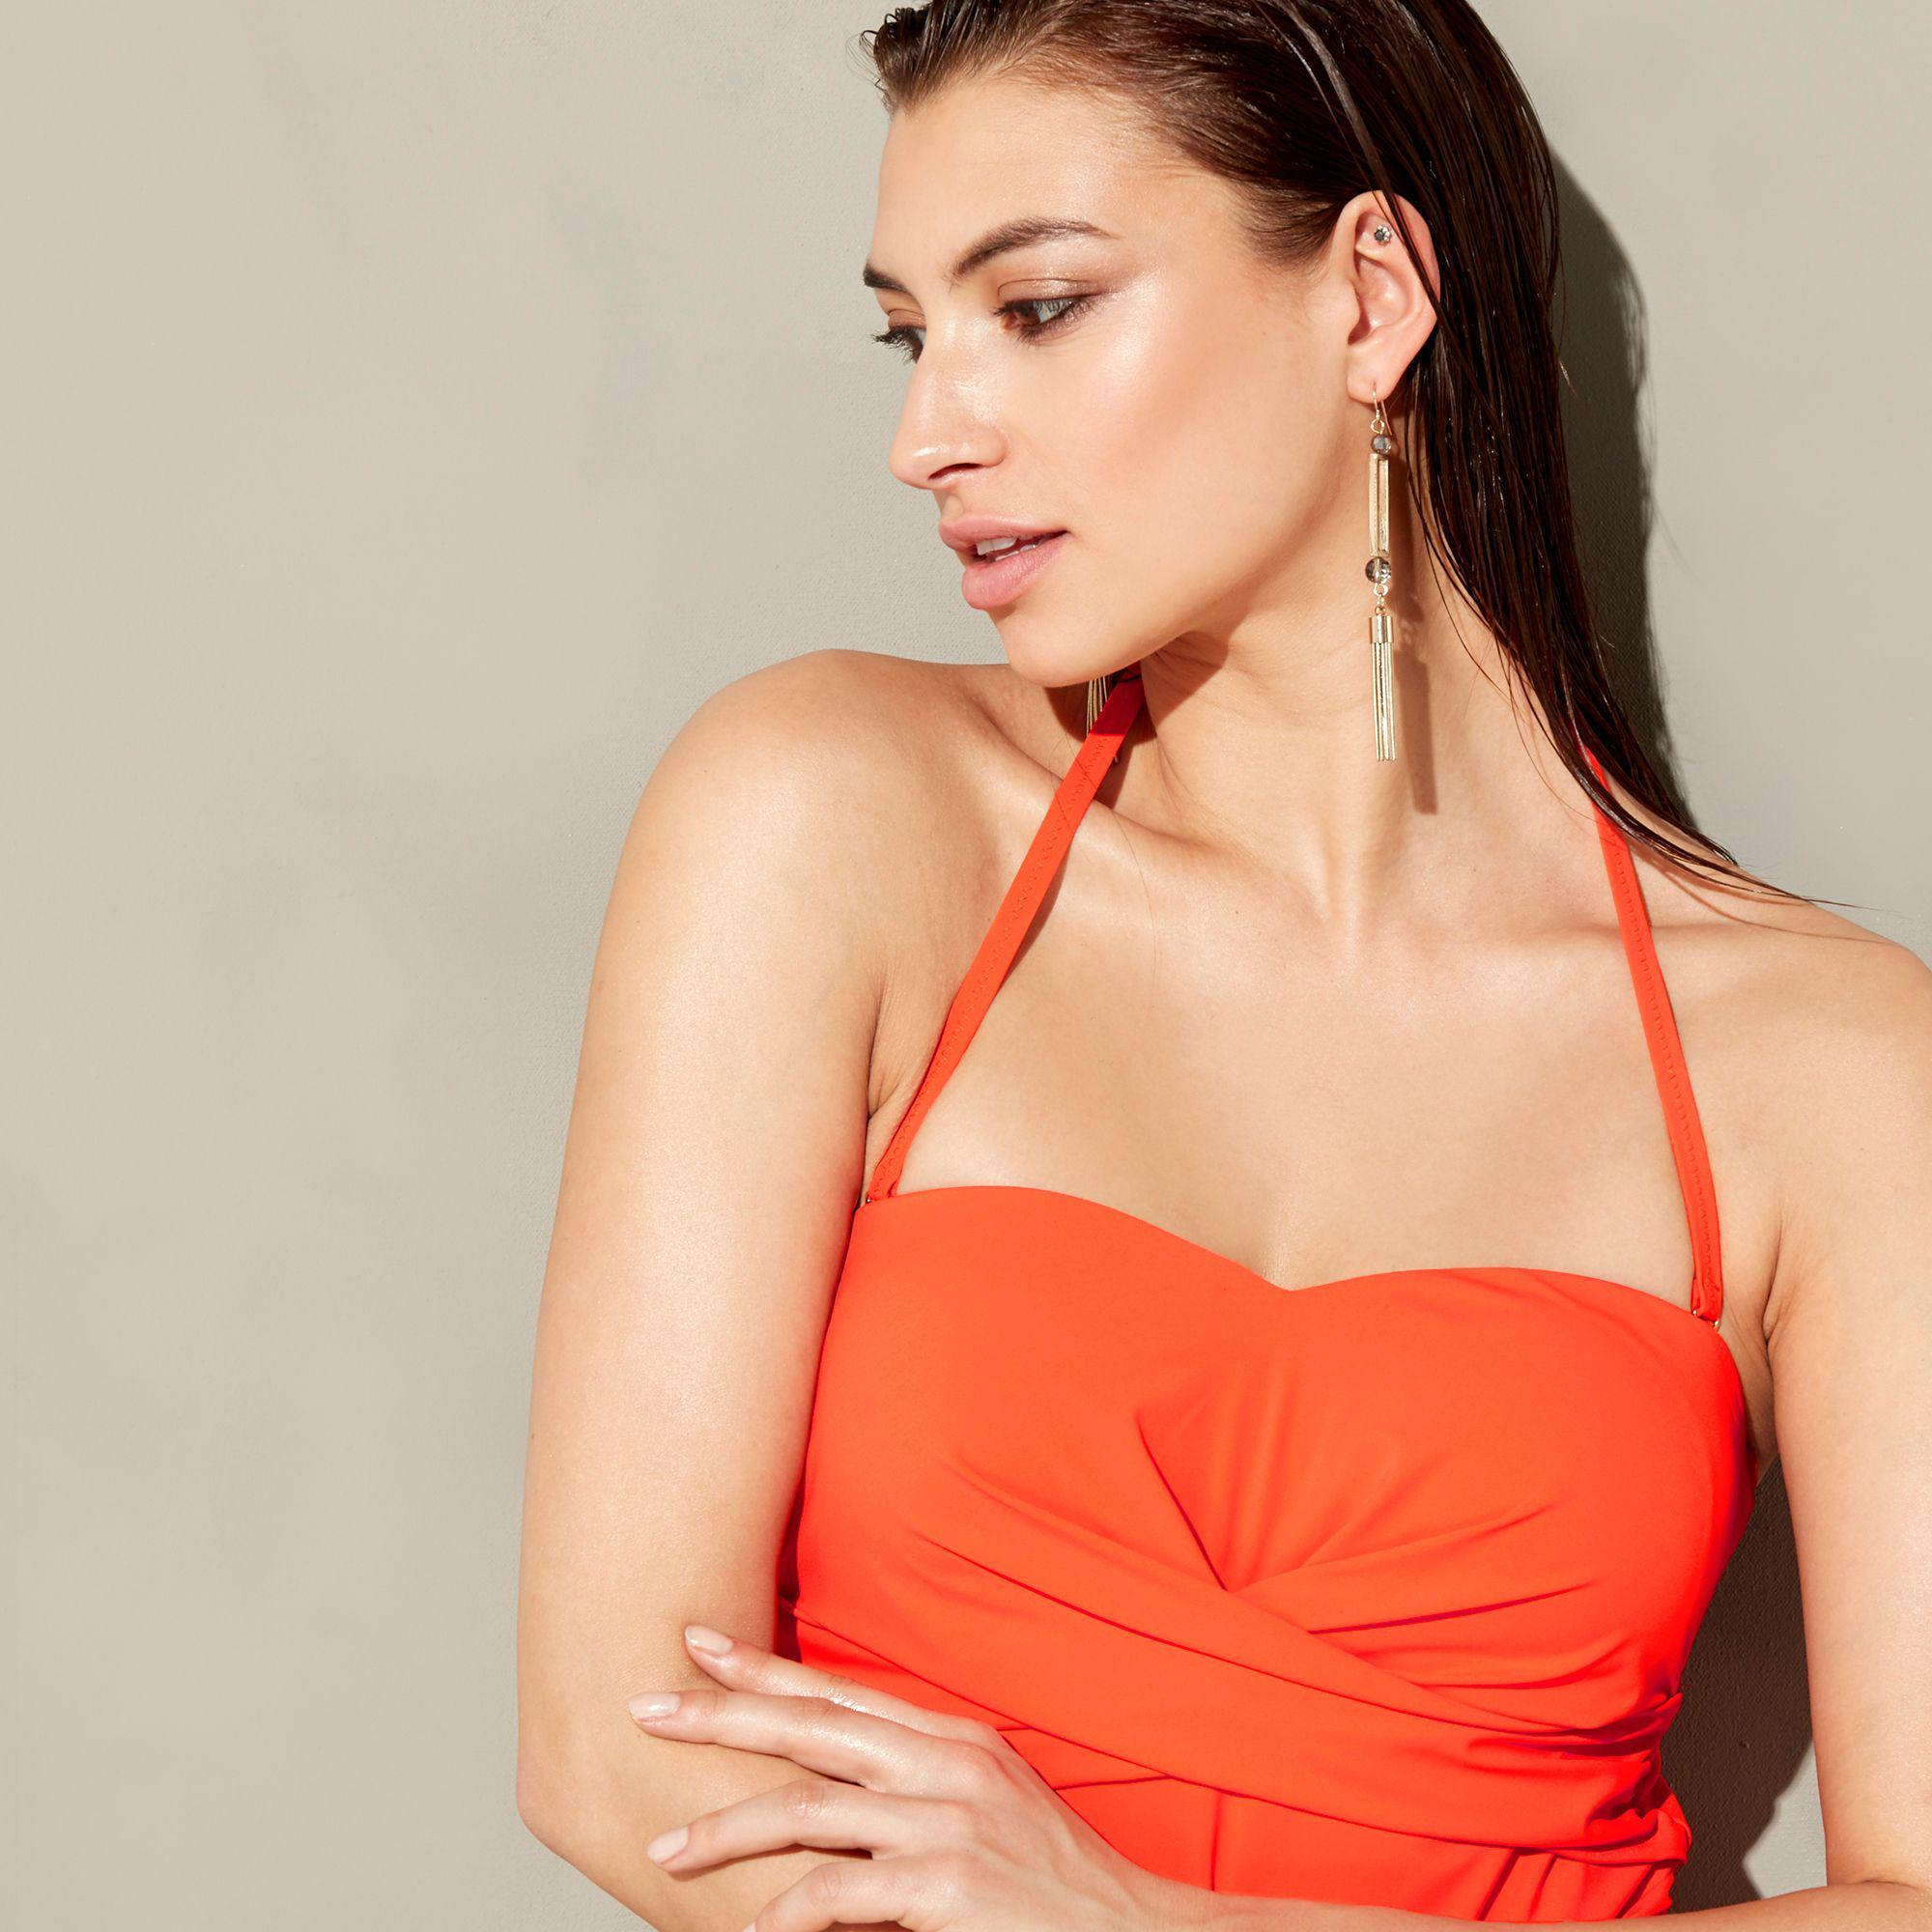 60e157b96dfcc J By Jasper Conran - Orange Twist Bandeau Swimsuit - Lyst. View fullscreen